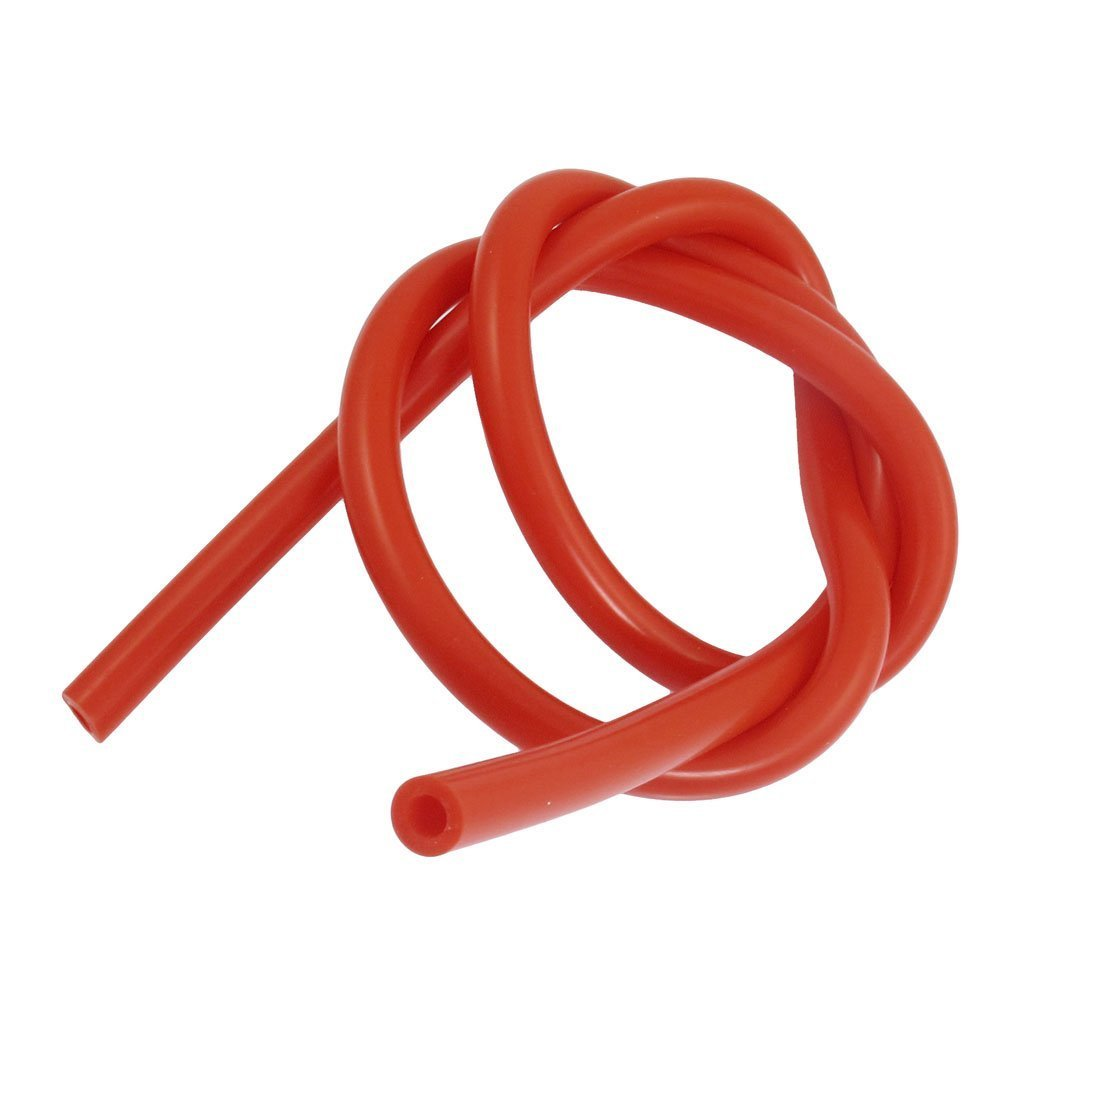 Sourcingmap a12071800ux0619 - De silicona de vací o tubo de manguera roja diá metro interno de 6 mm 1 m de largo